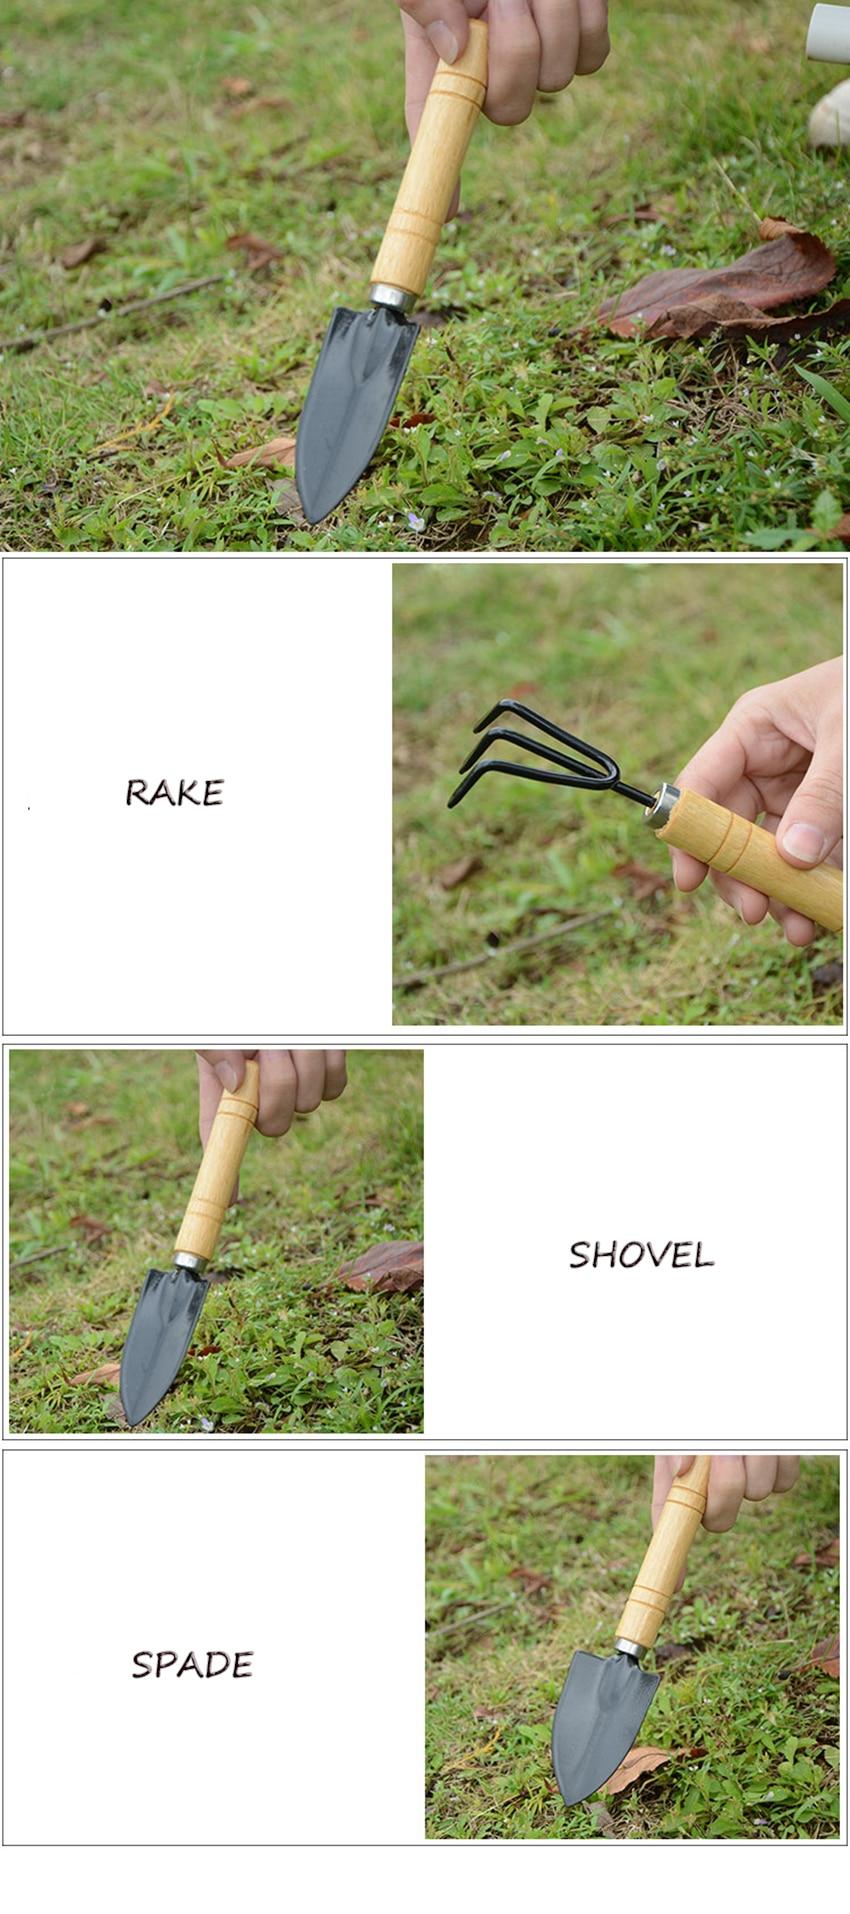 Hot Sale 3PC/Set Mini Garden Hand Tool Kit Plant Gardening Shovel Spade Rake With Wood Handle Metal Head For Gardener